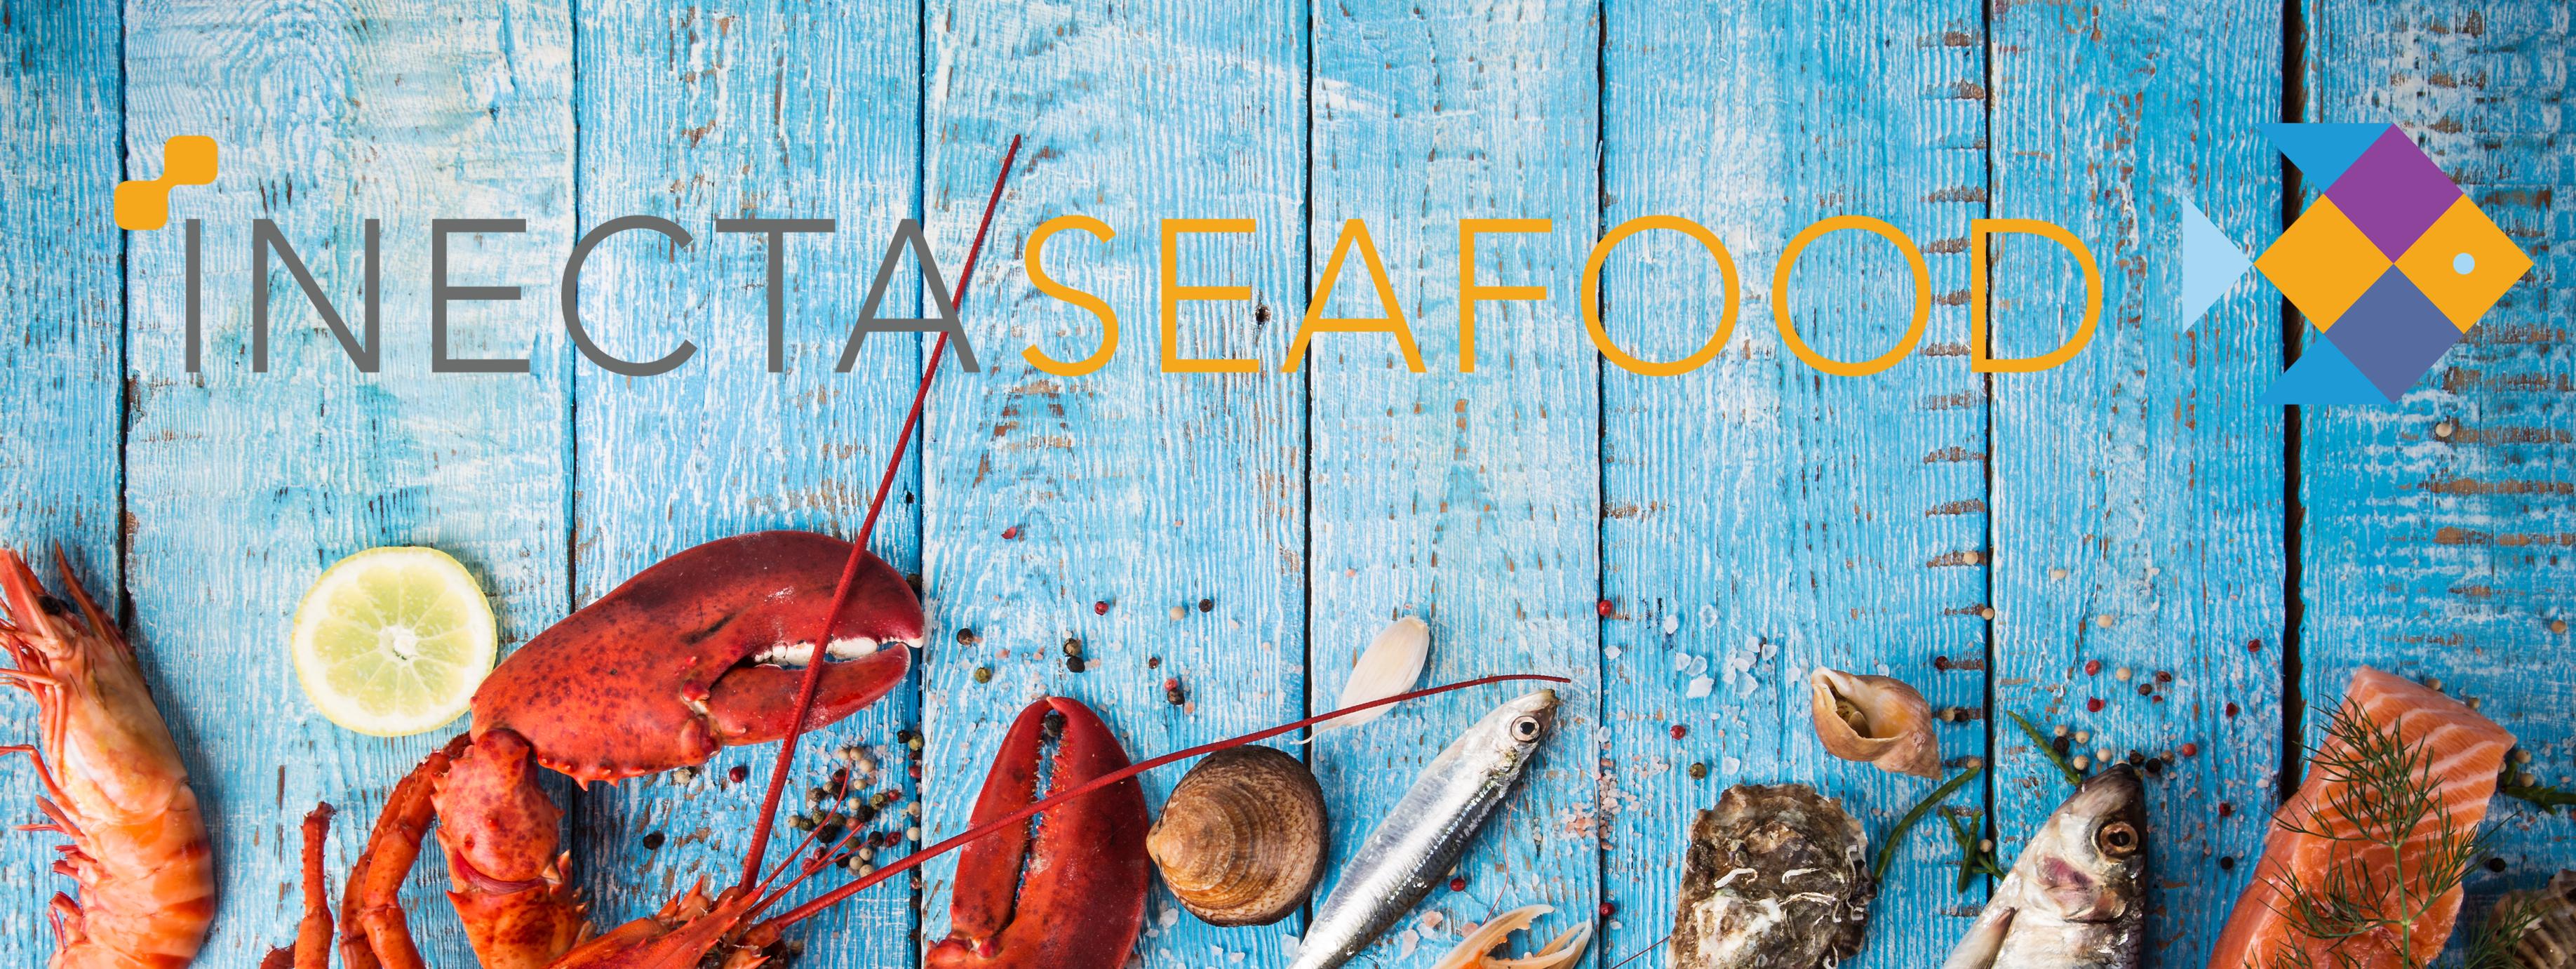 seafood fundamentals